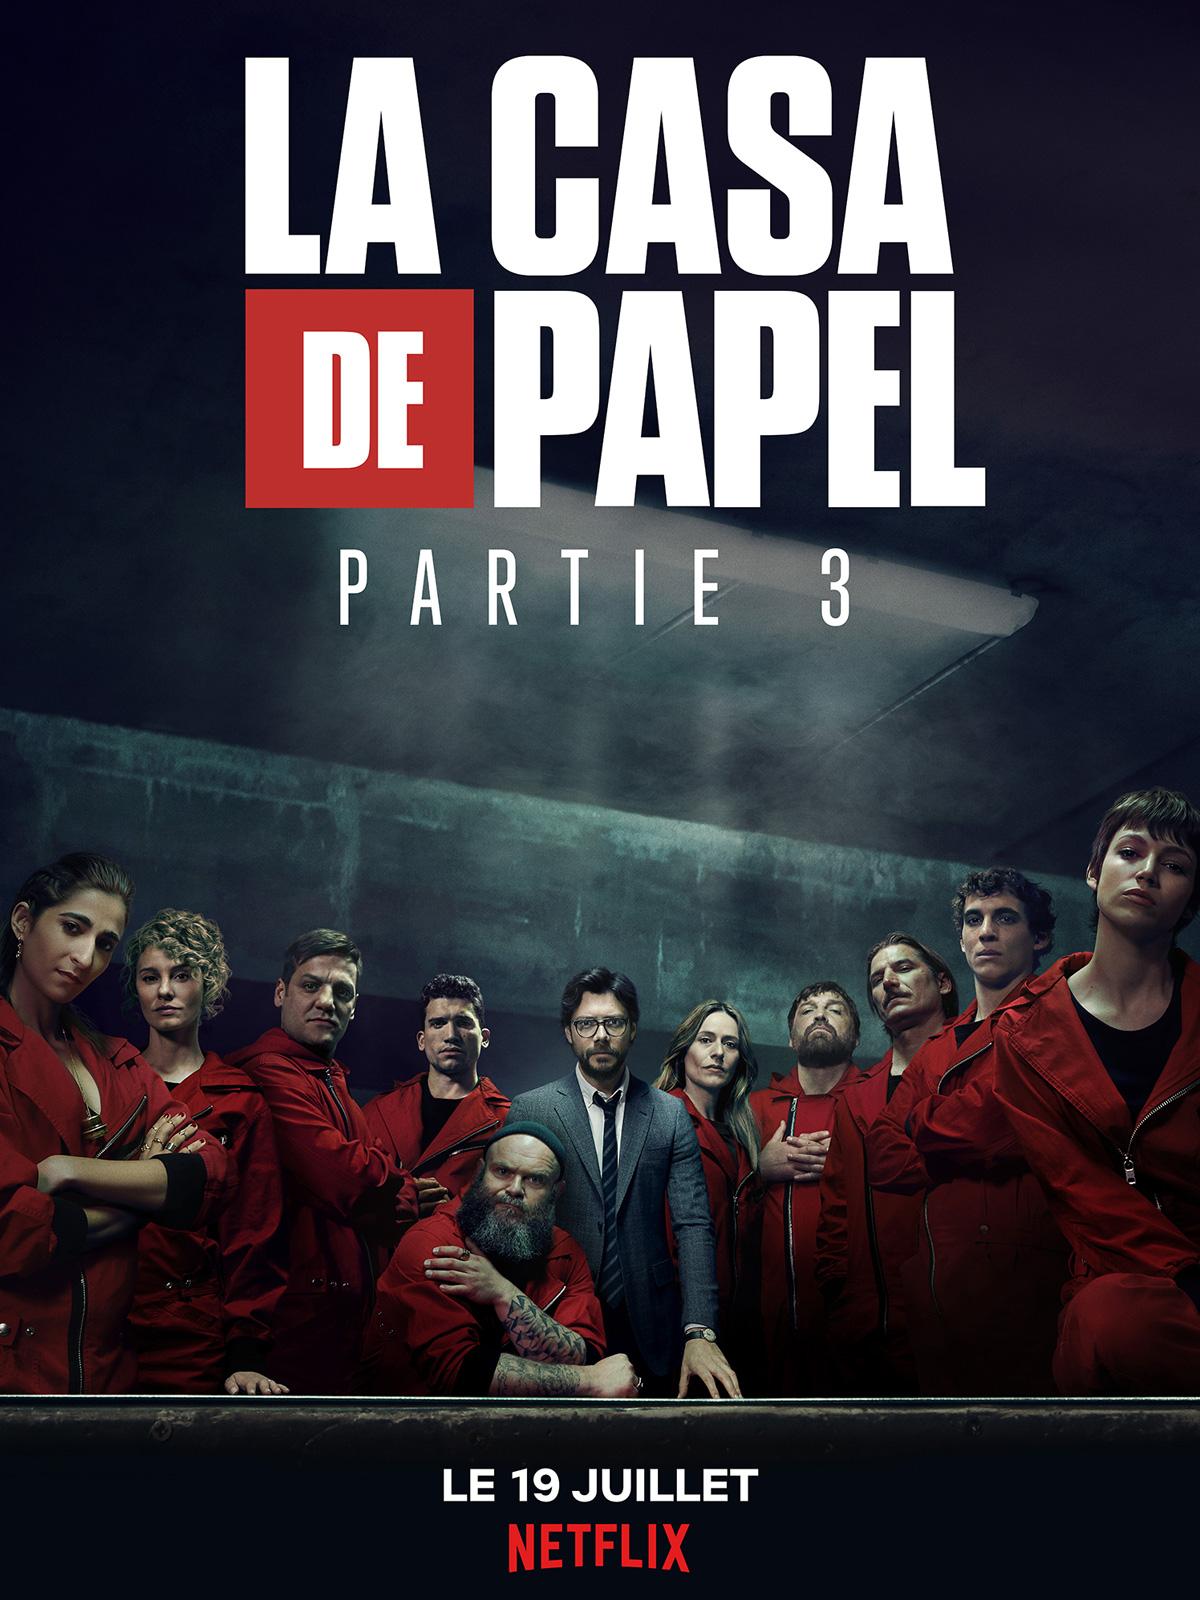 La Casa De Papel Saison 3 Episode 2 Streaming : papel, saison, episode, streaming, Papel, Saison, AlloCiné